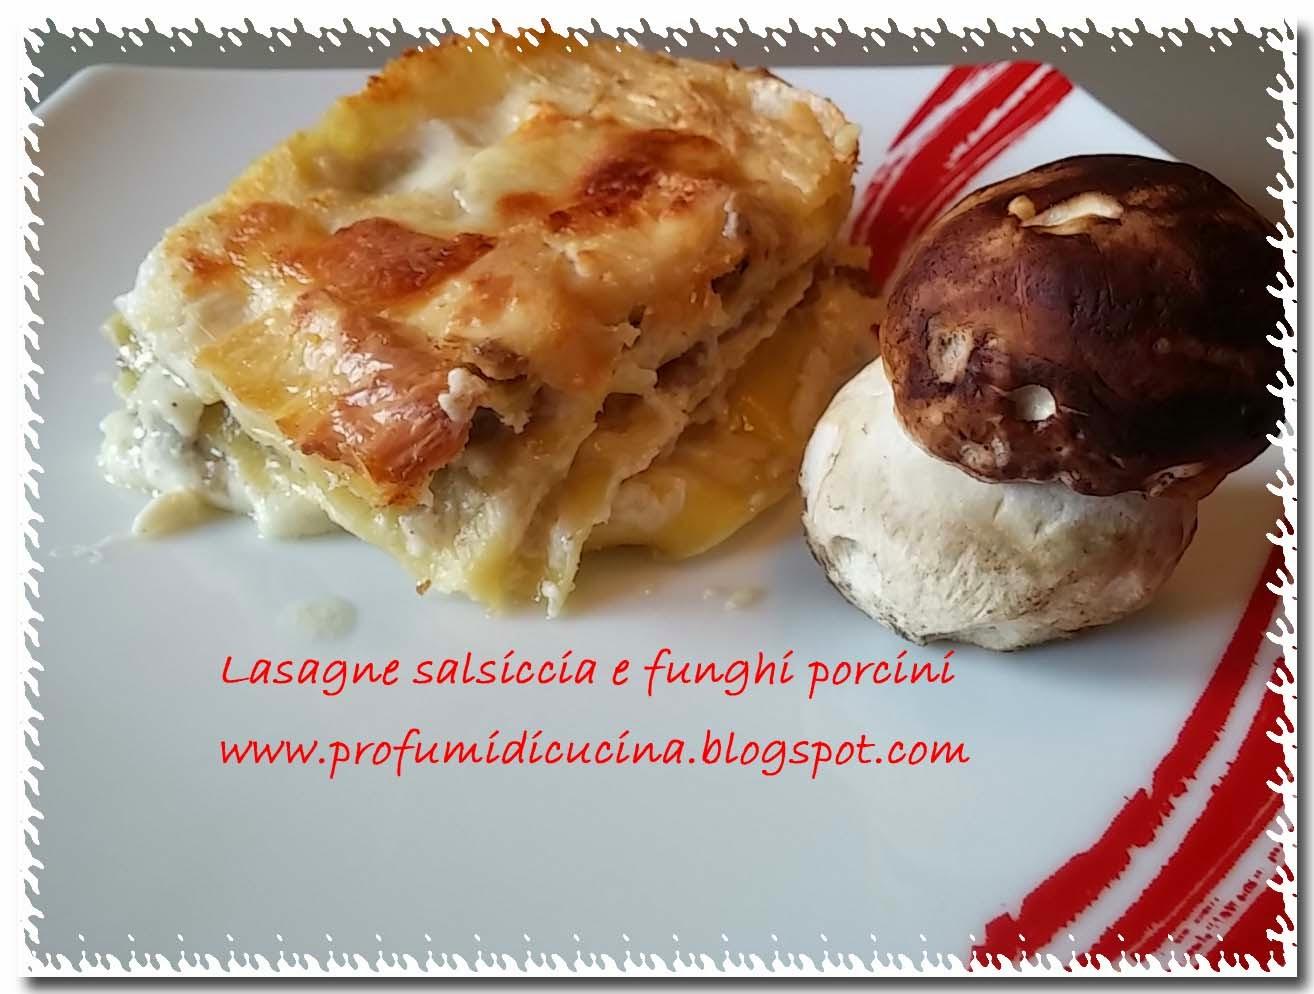 lasagne salsiccia e funghi porcini